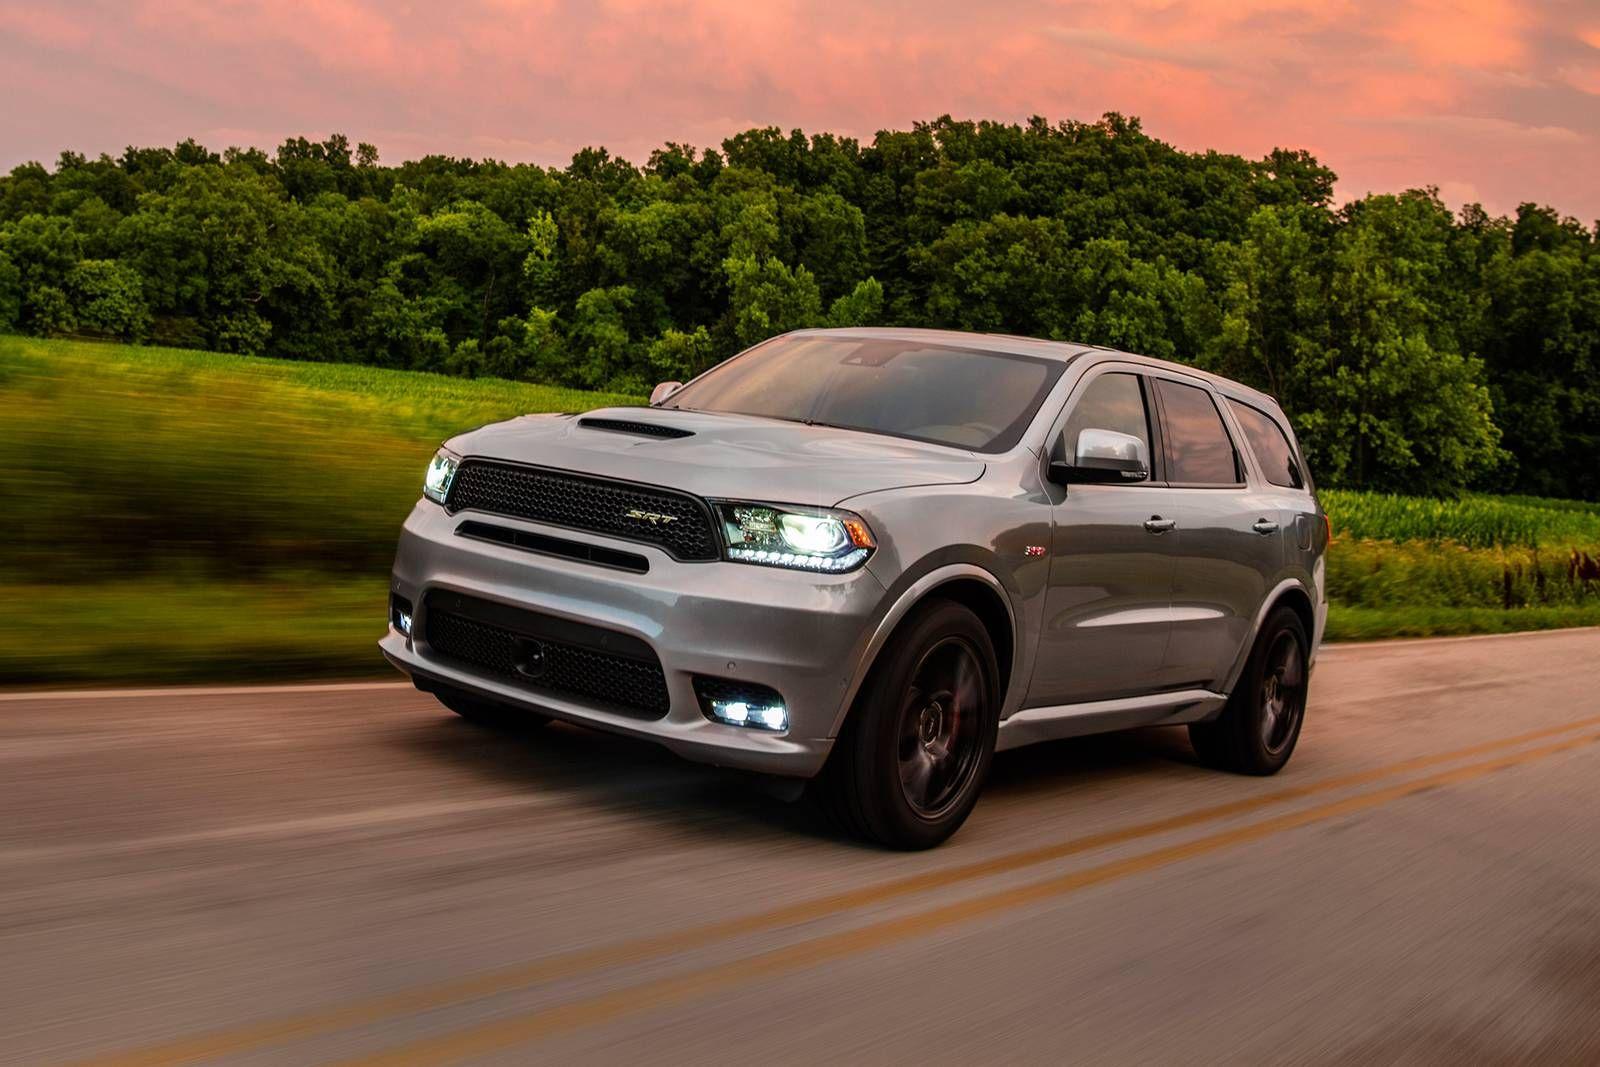 2018 Dodge Durango Rt For Sale Near Me Dodge Durango Chevrolet Traverse 2018 Dodge